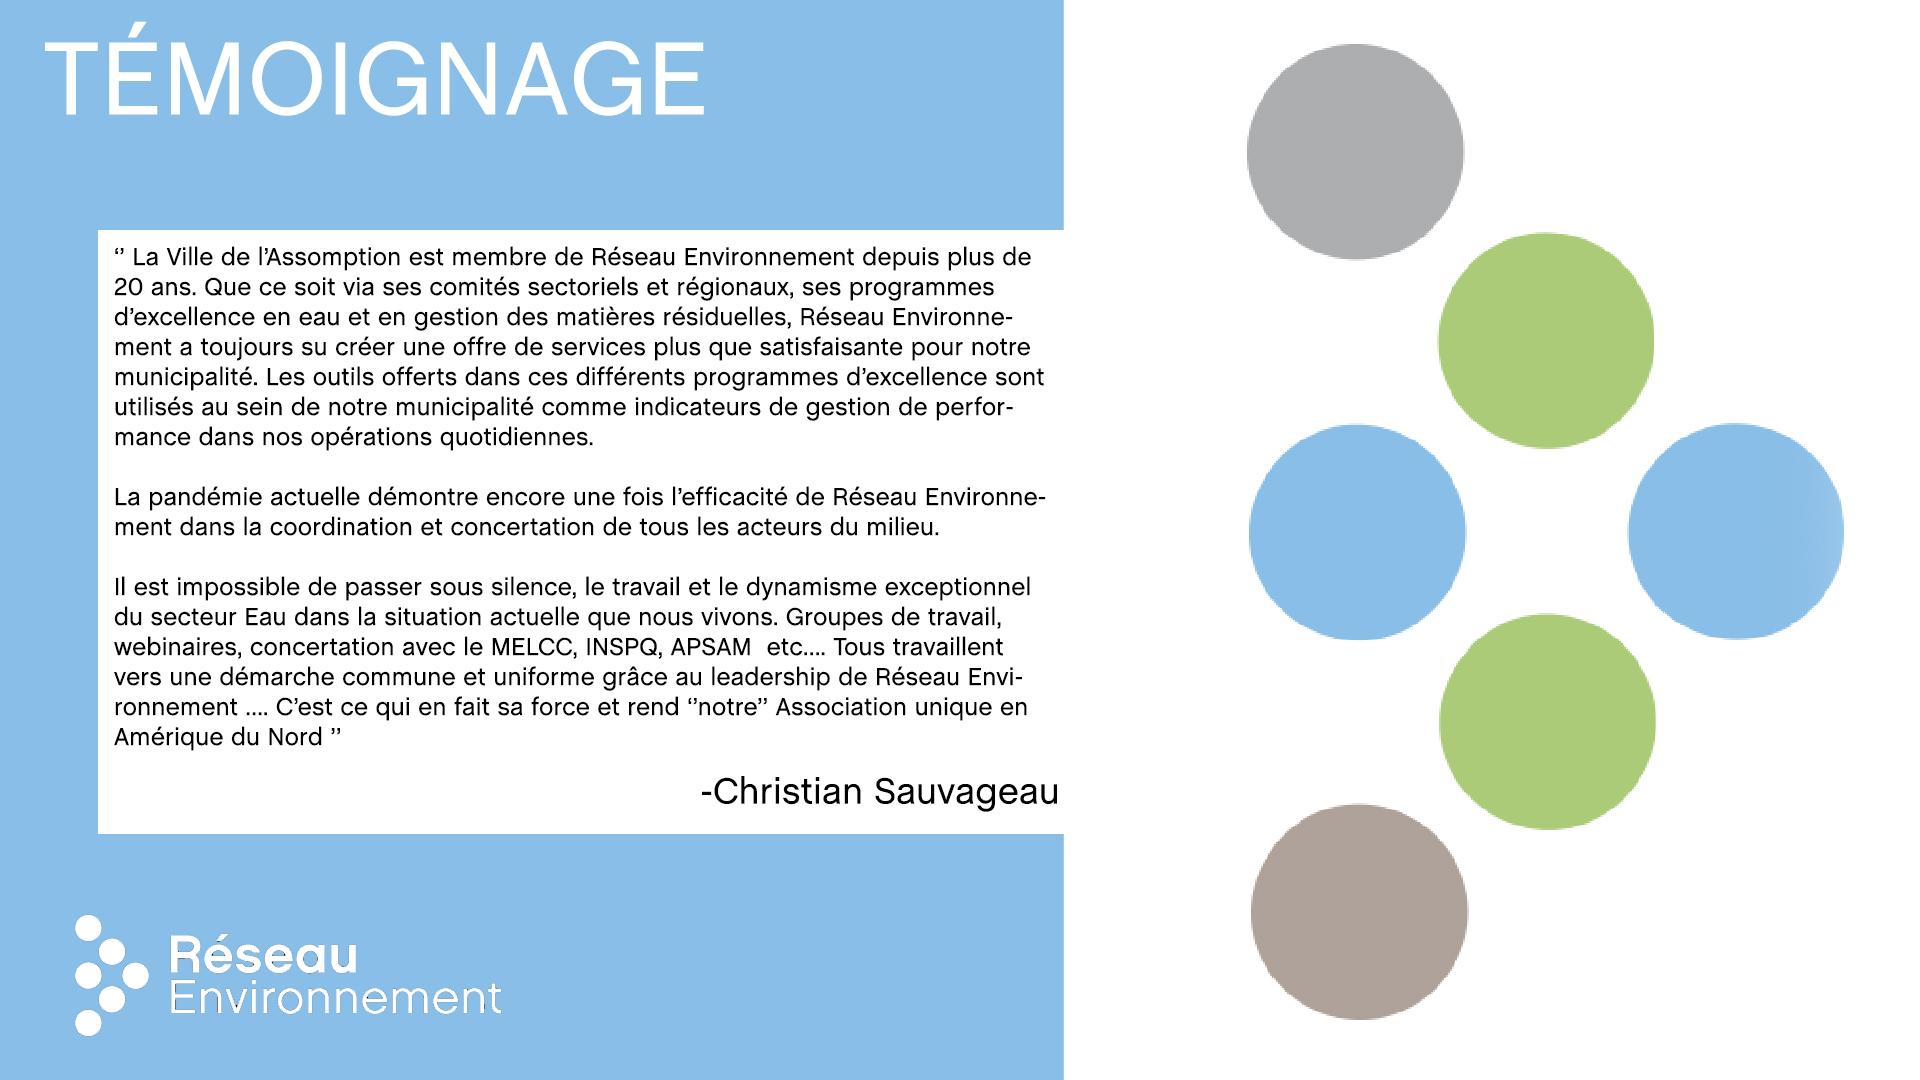 témoignage-Christian-Sauvageau